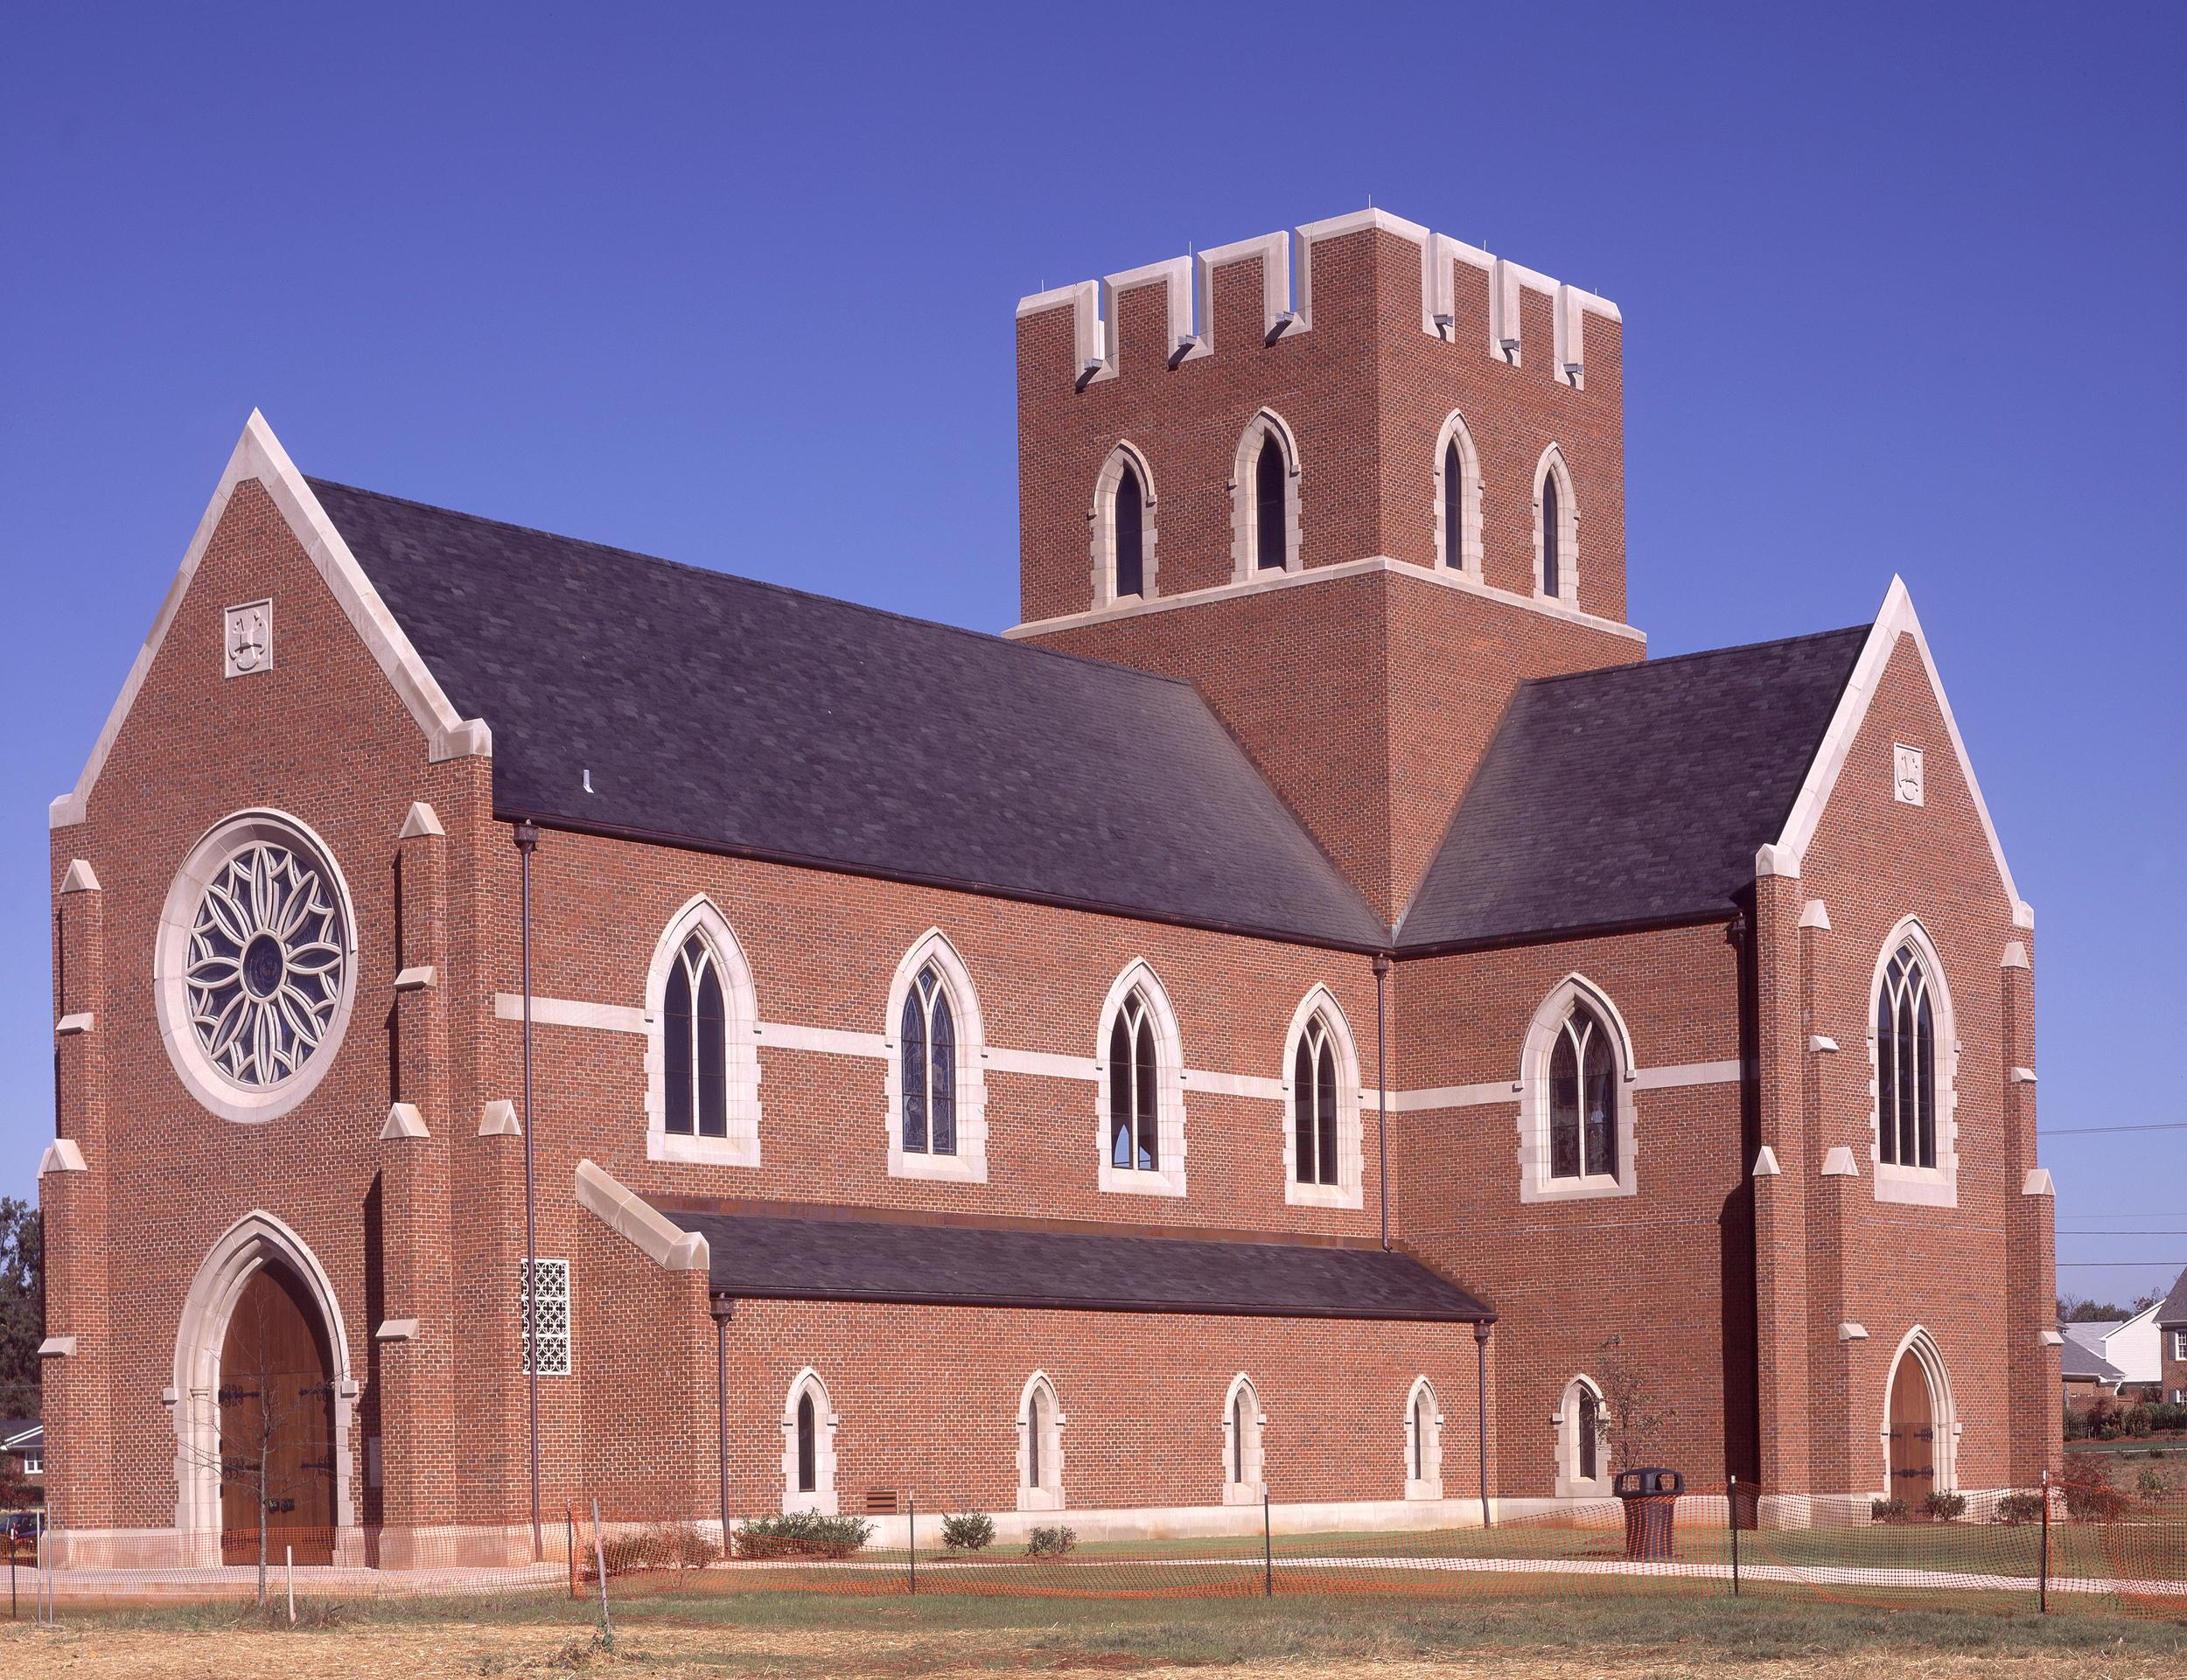 The Canterbury School New Chapel  Greensboro, NC: 2002